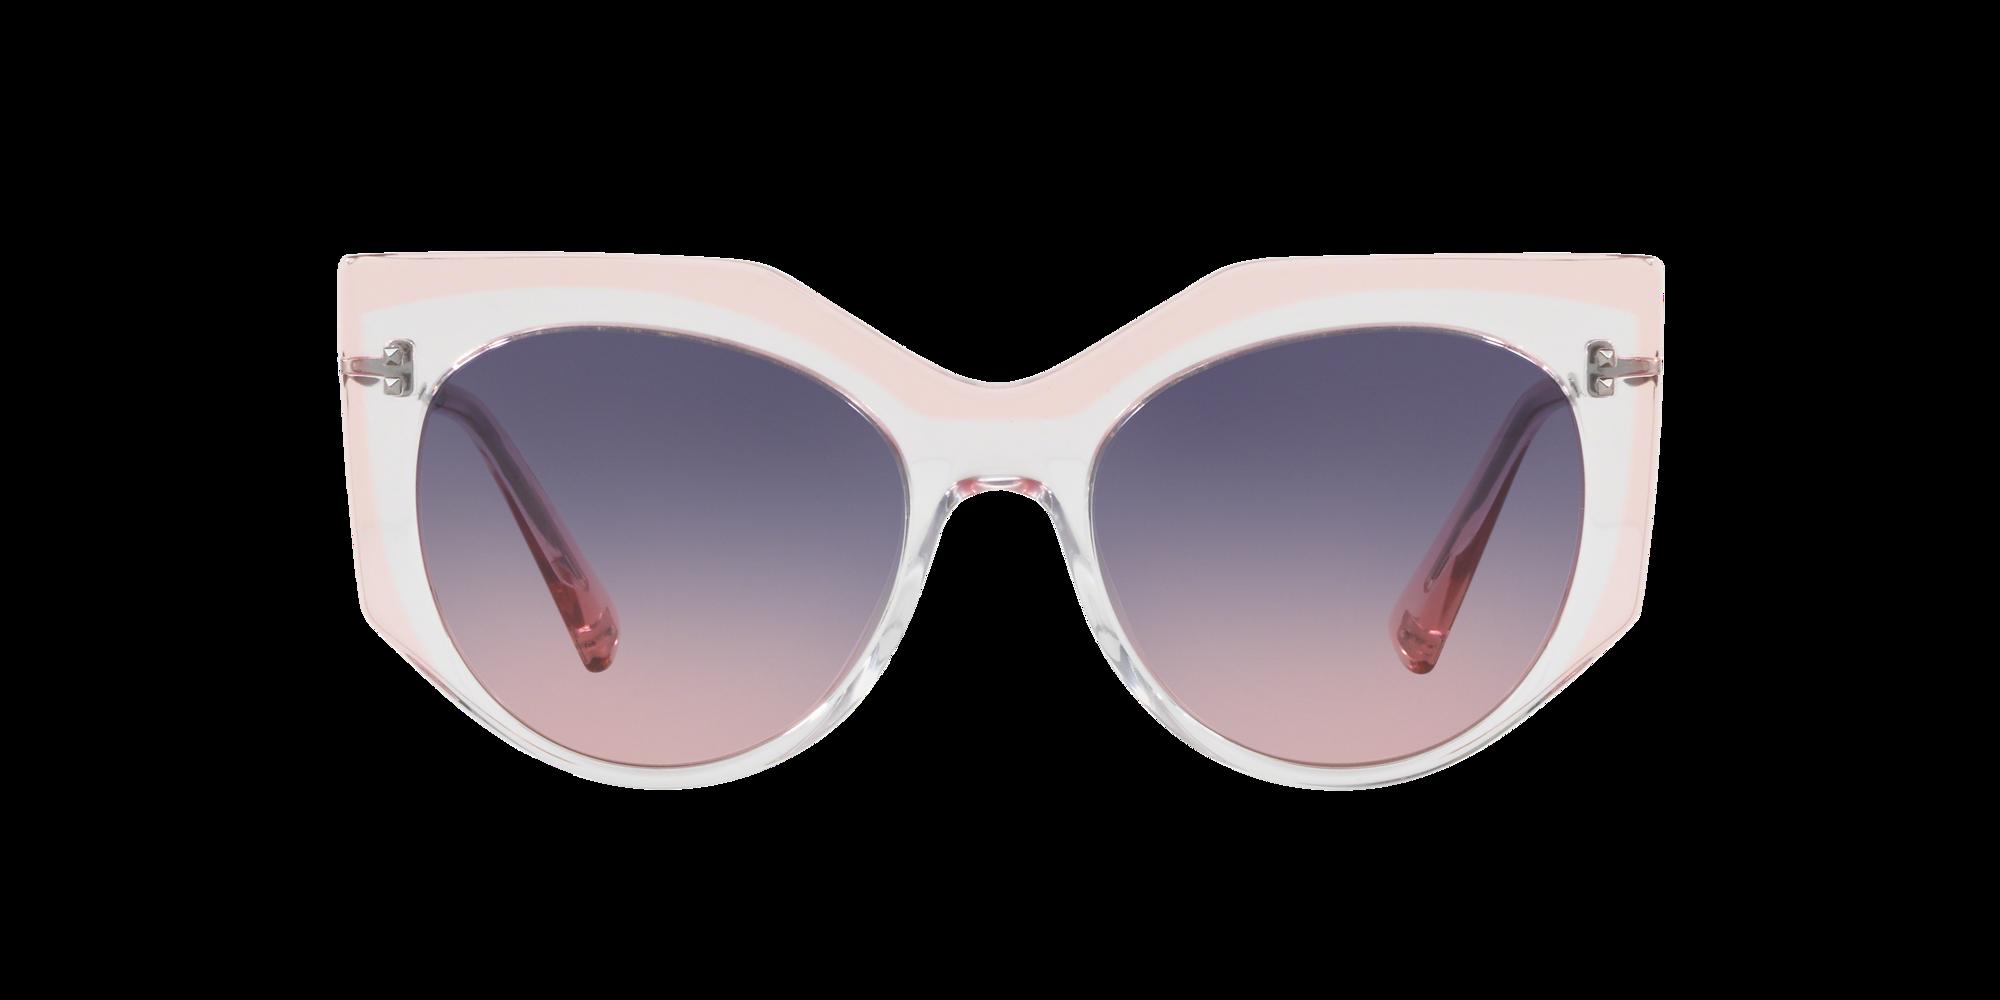 Image for VA4033 53 from LensCrafters   Glasses, Prescription Glasses Online, Eyewear